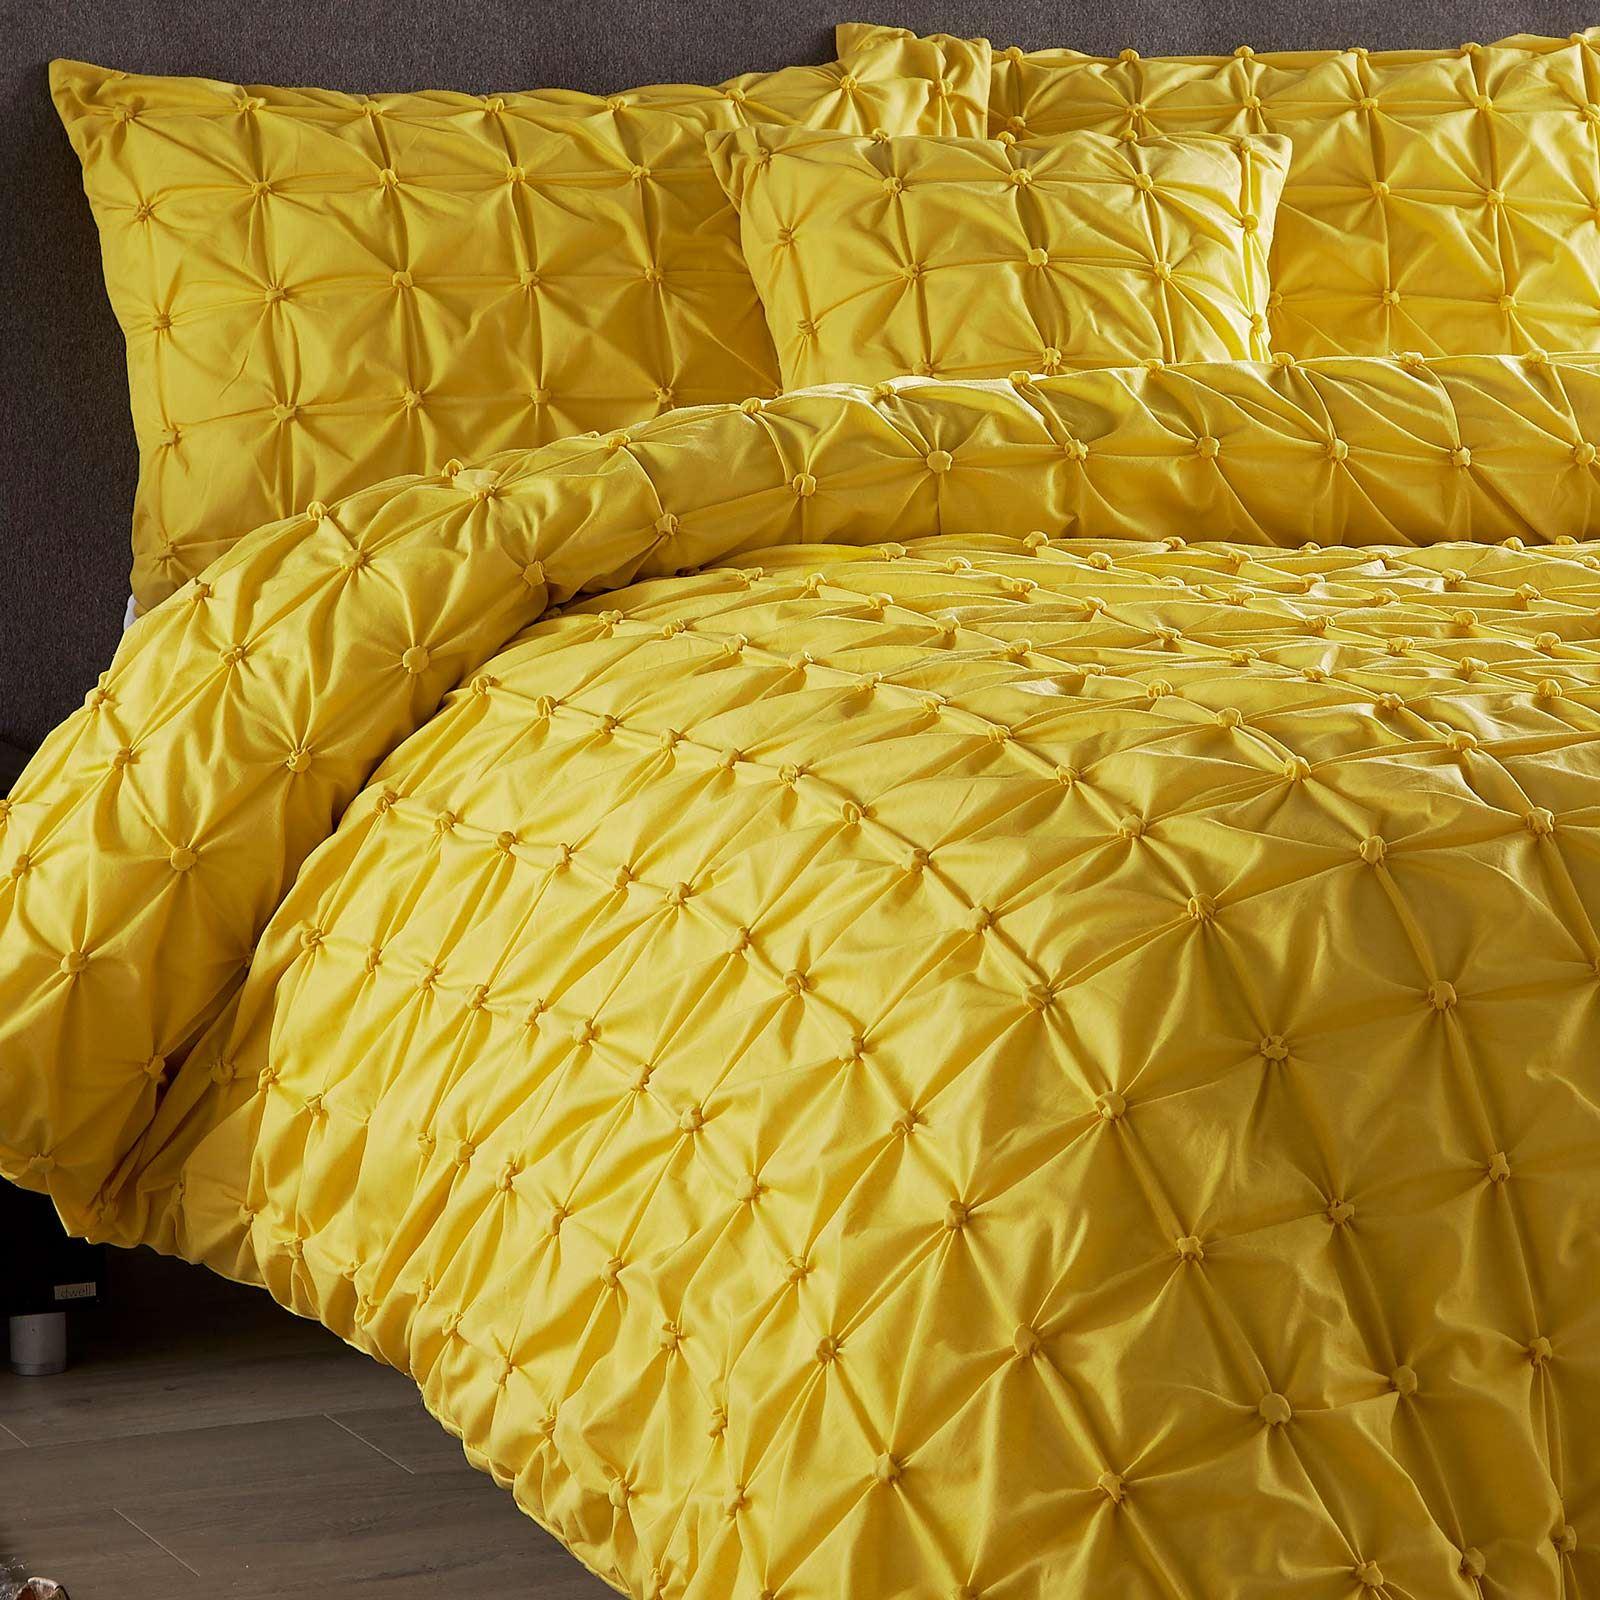 Pleated-Duvet-Covers-Seville-Pintuck-Luxury-Cotton-Rich-Quilt-Bedding-Sets thumbnail 8